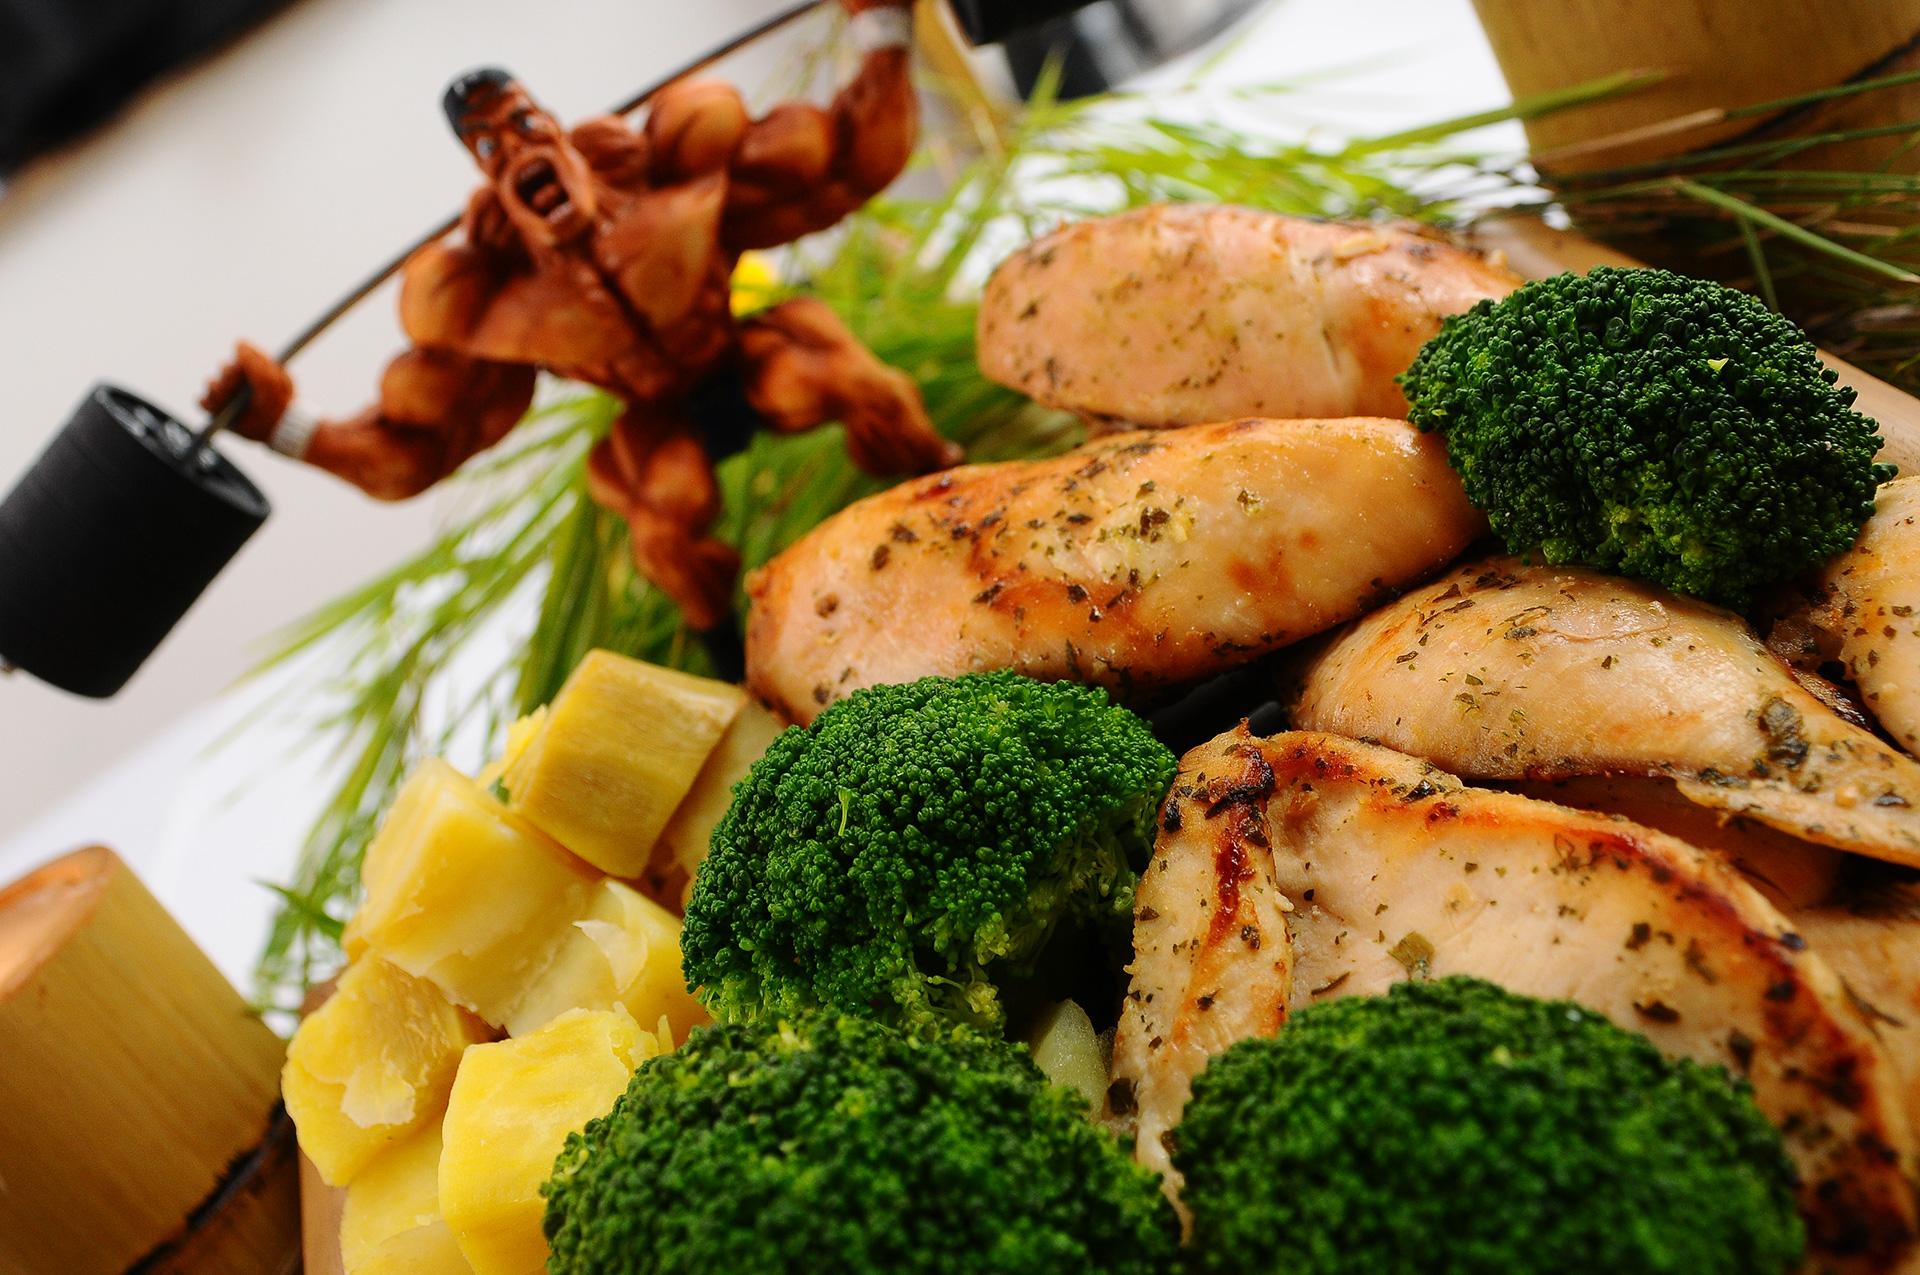 Dieta dos frangos